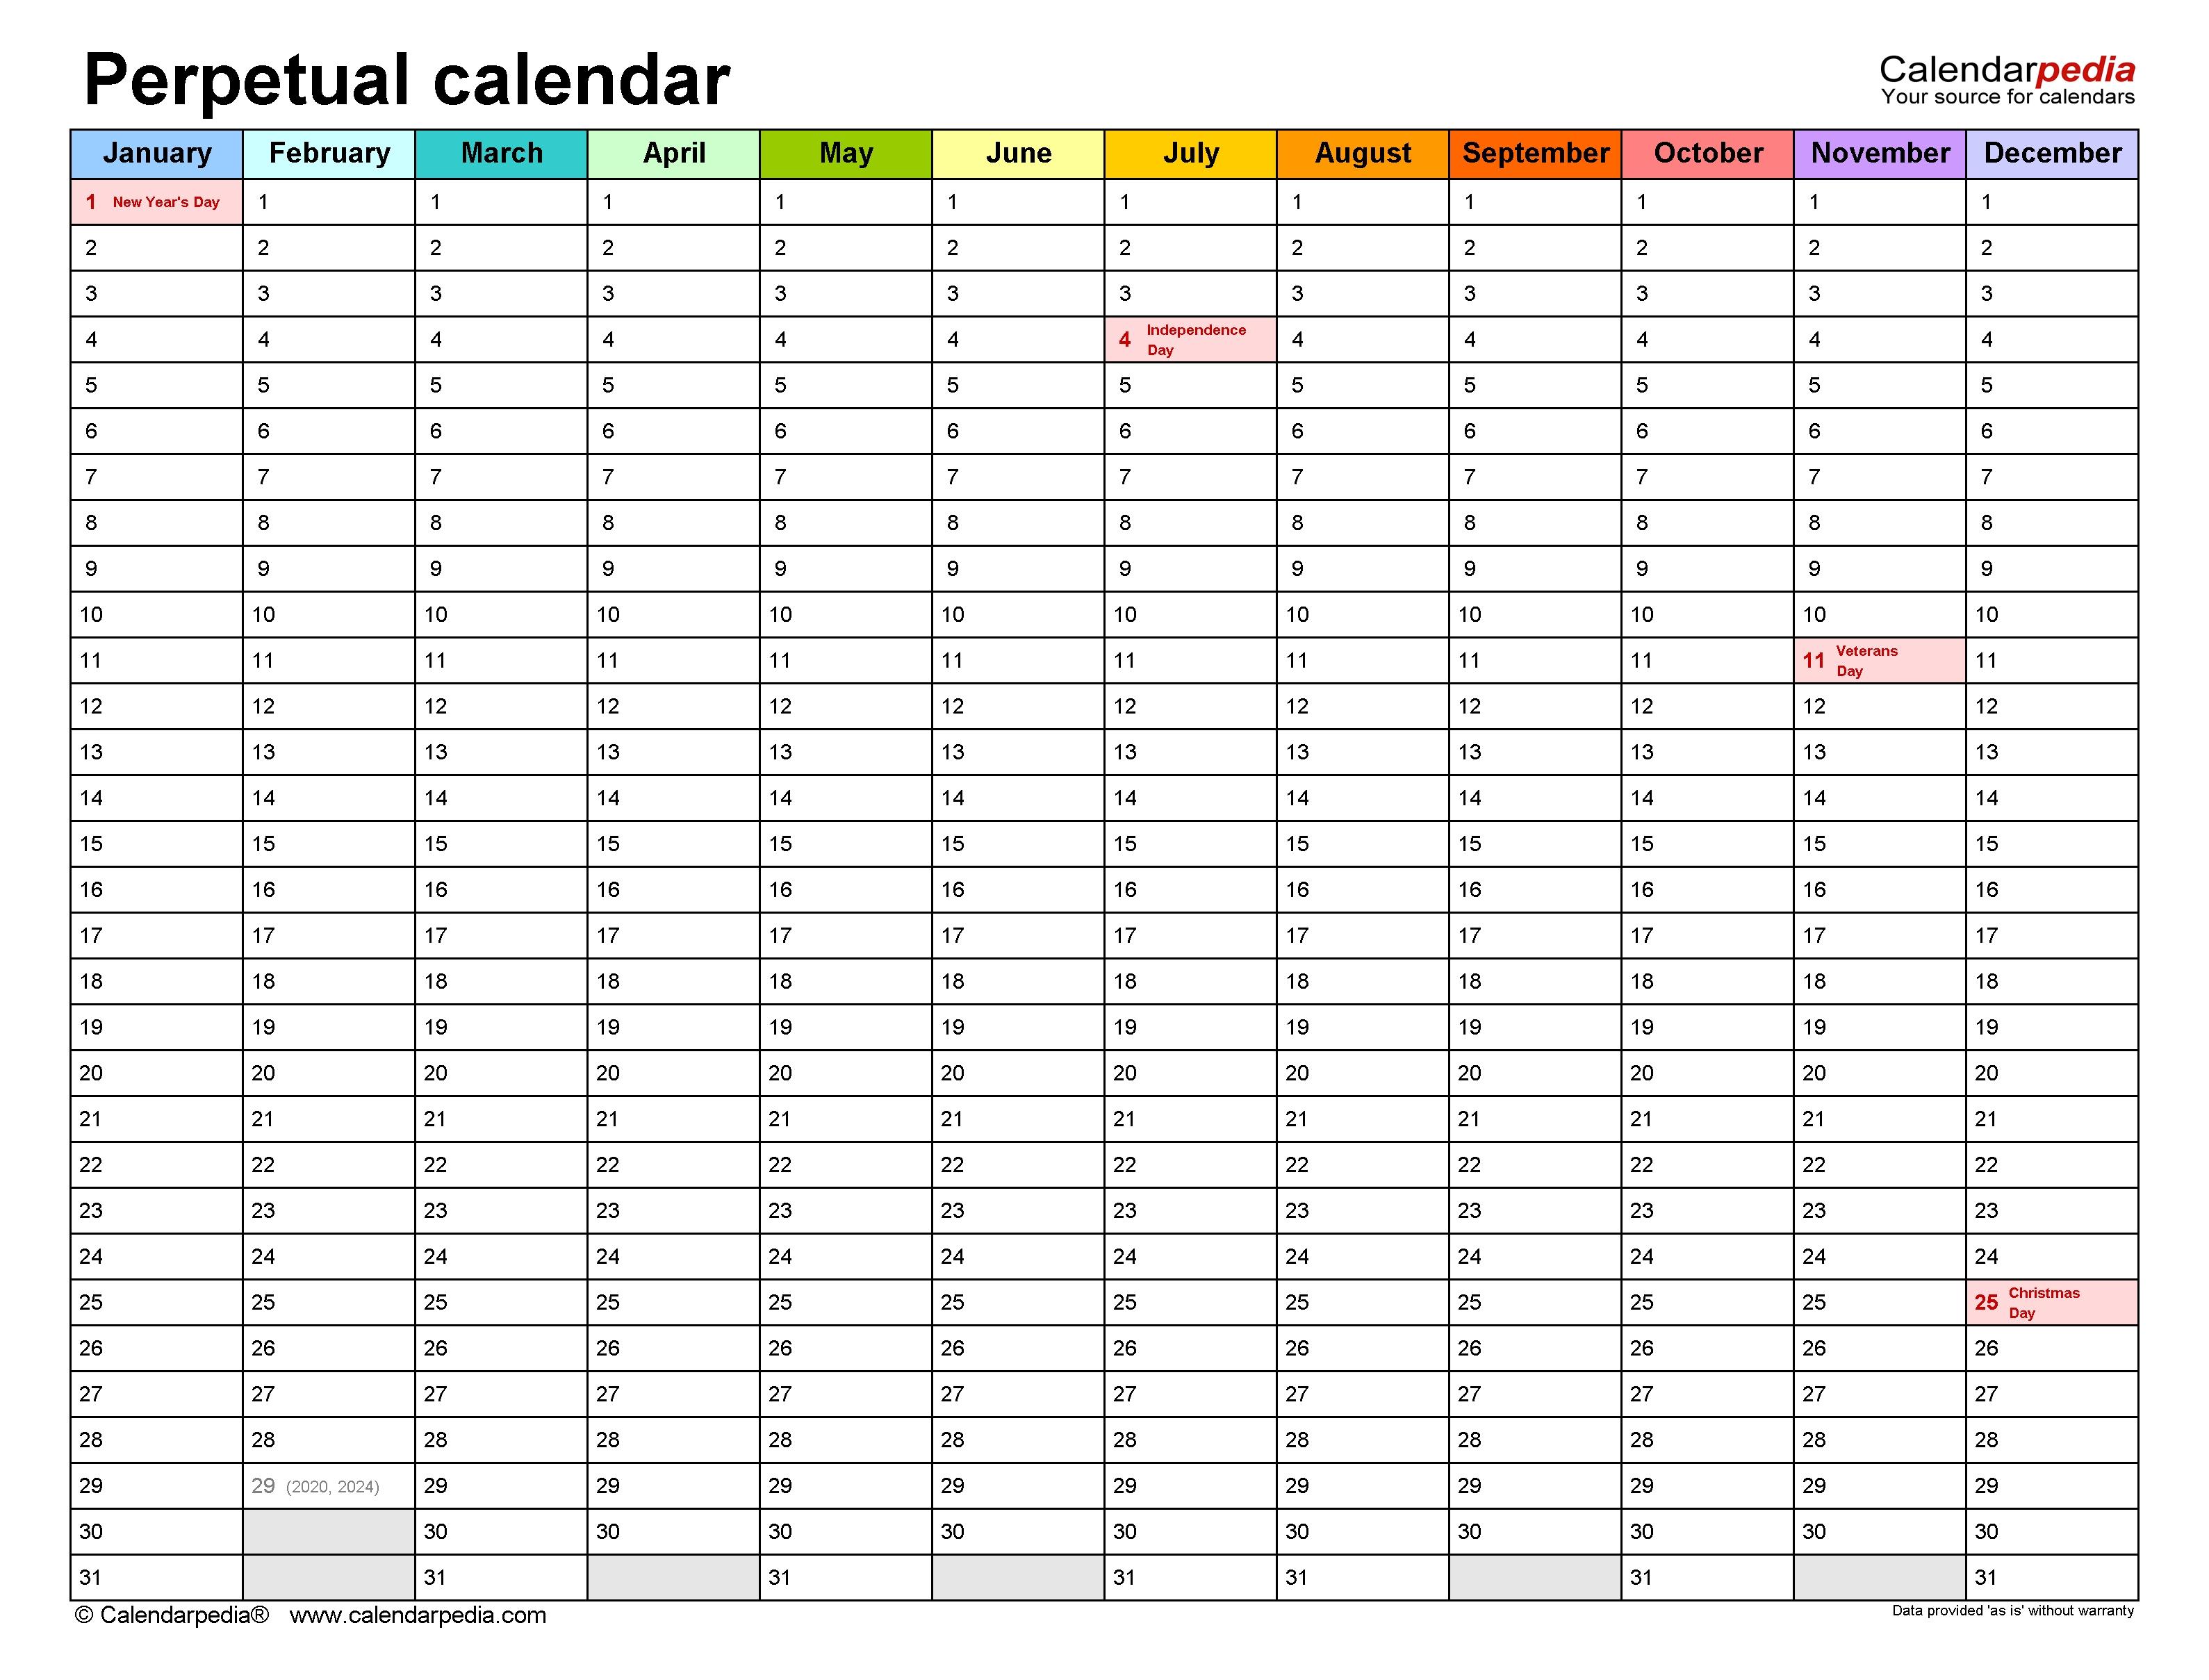 Perpetual Calendars - Free Printable Microsoft Excel Templates 5 Year Calendar Template Excel